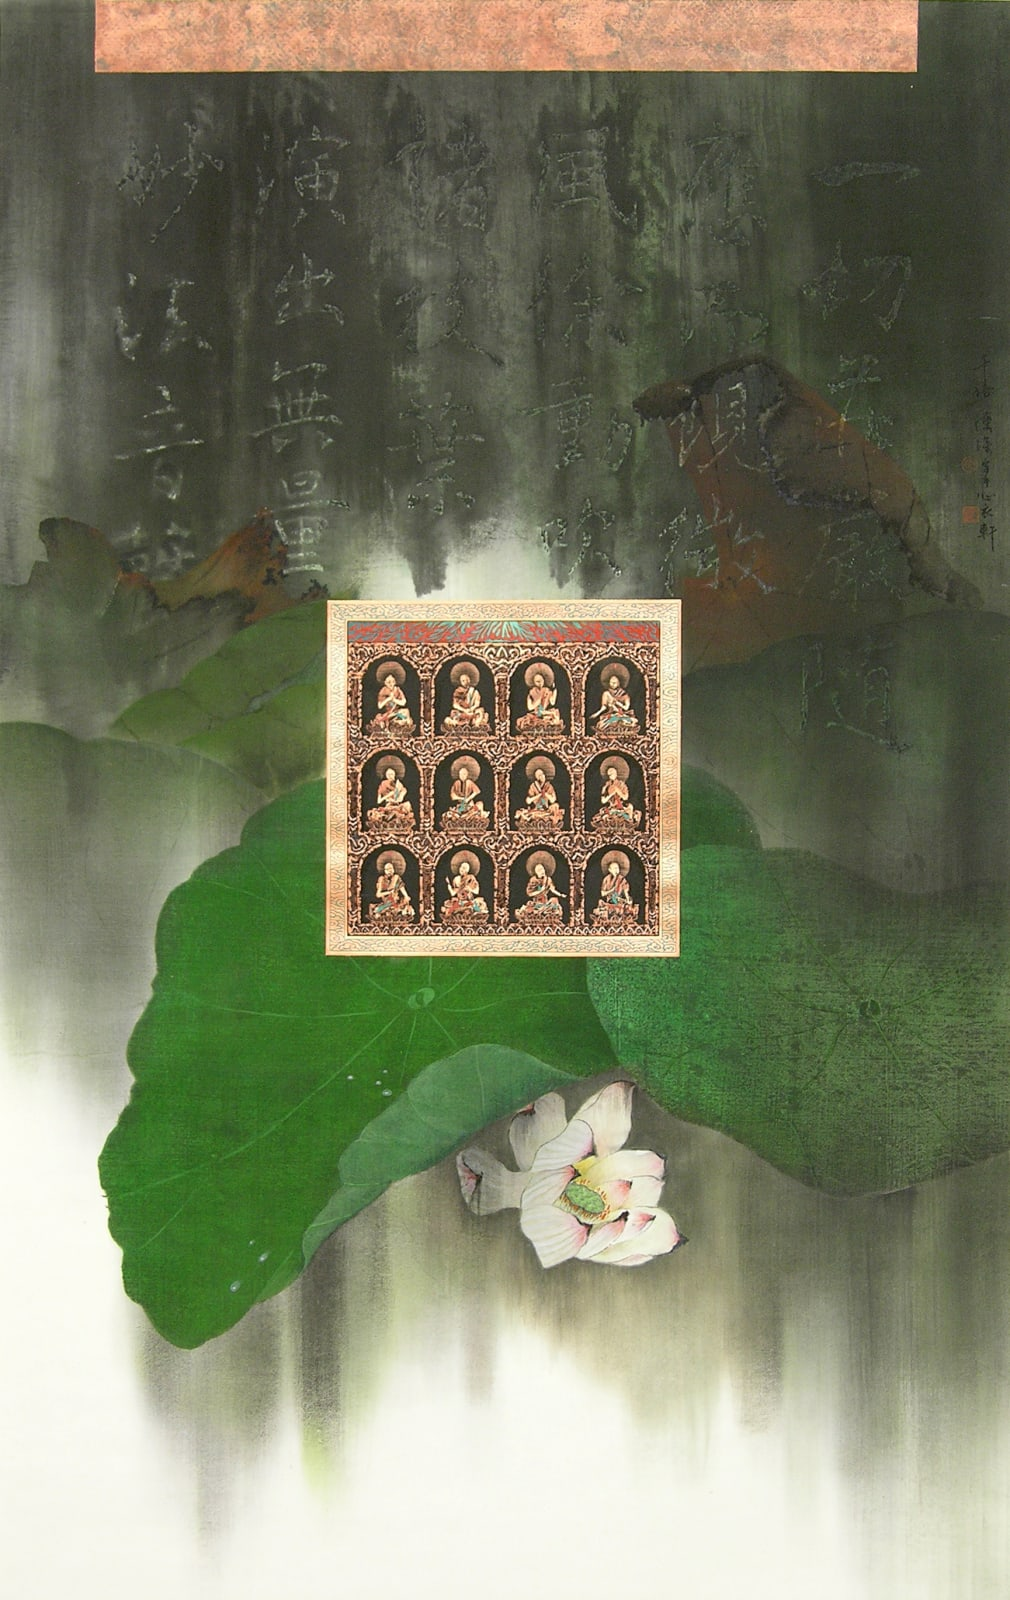 Kwok Hon Sum 郭漢深, Dharma Rain 法雨, 2000